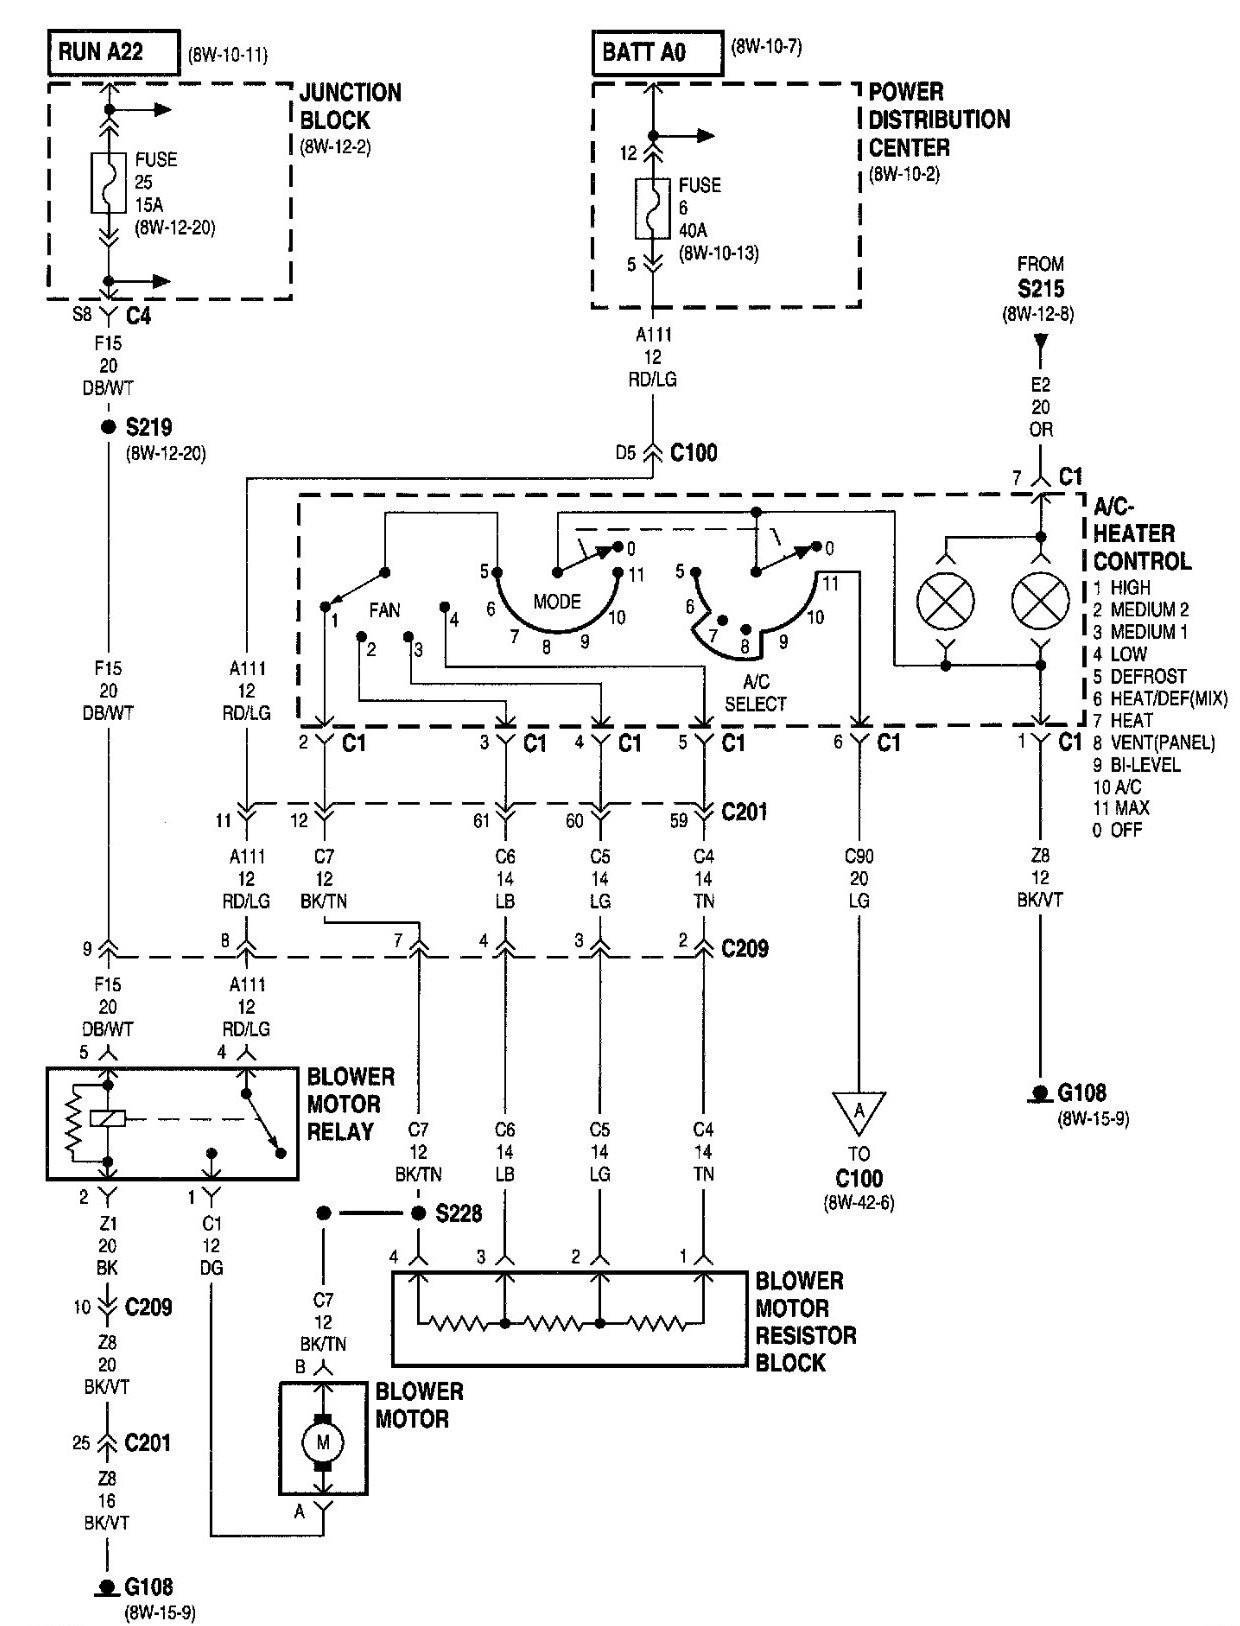 Honda Outboard Wiring Diagram Electrical Schematics 11 Hp Bf40 Starter Diy Enthusiasts Diagrams U2022 Fuel Gauge